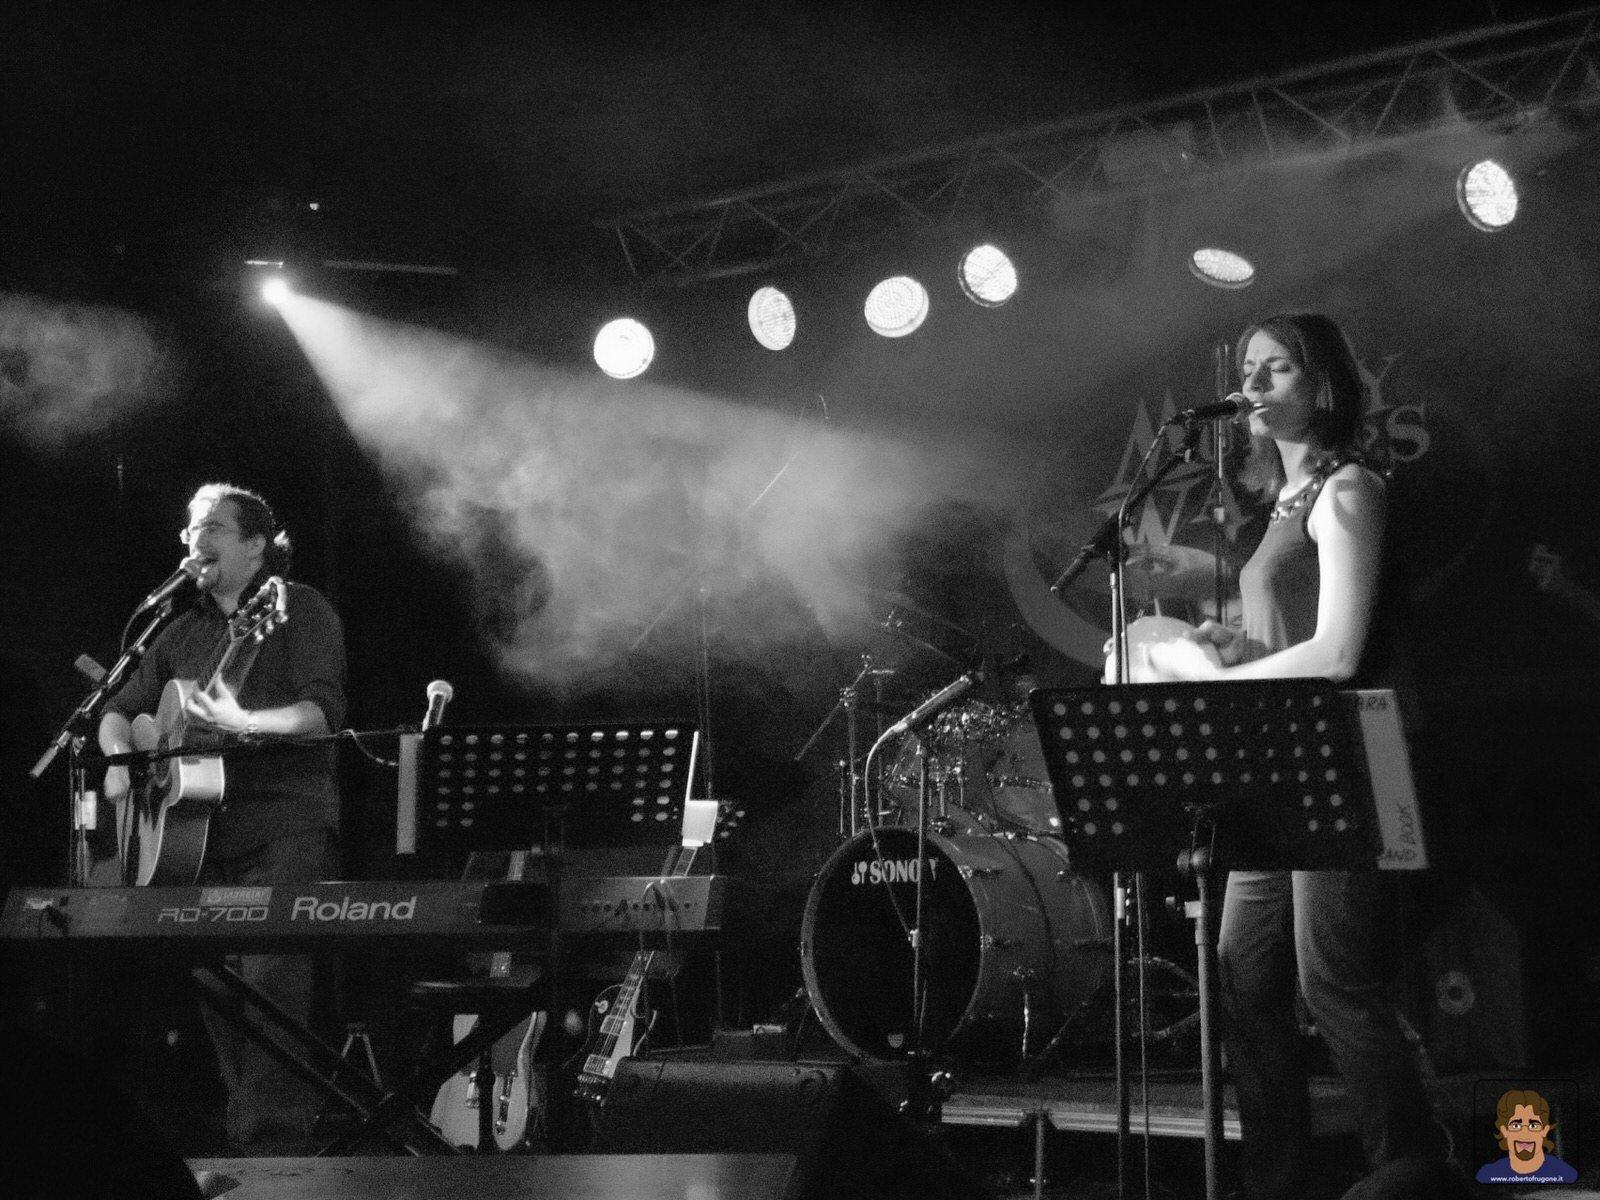 Roberto Frugone Band cantautore live concerto Calvari Muddy Waters 04